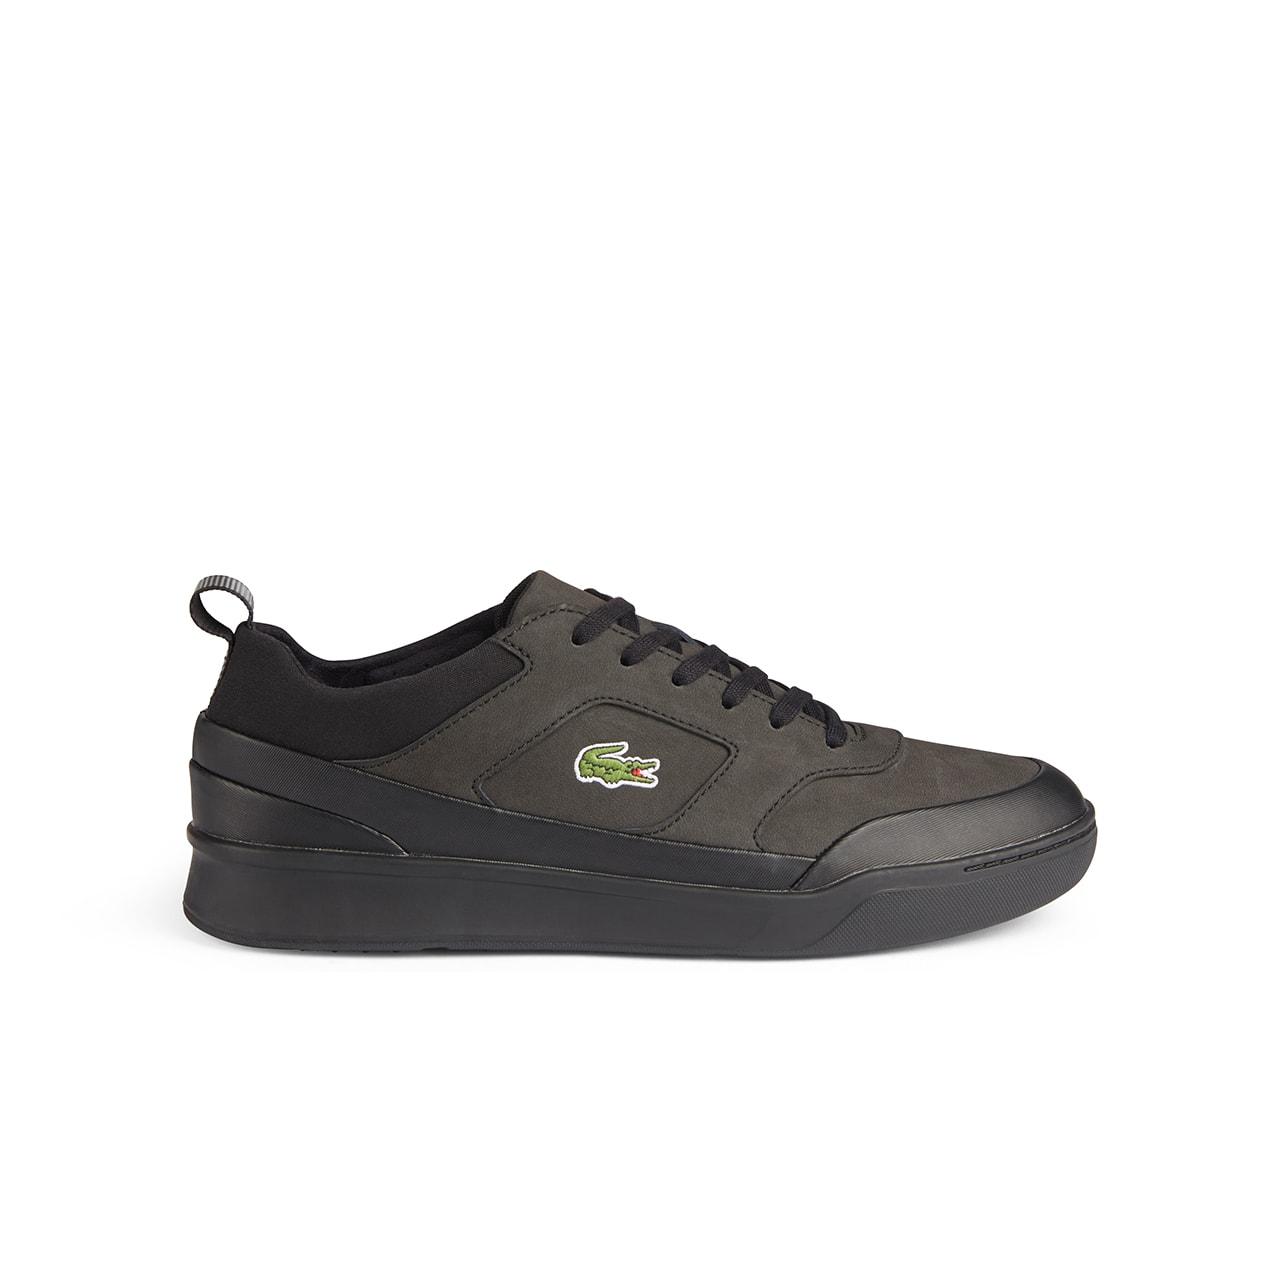 Men's Explorateur Sport Leather Sneakers